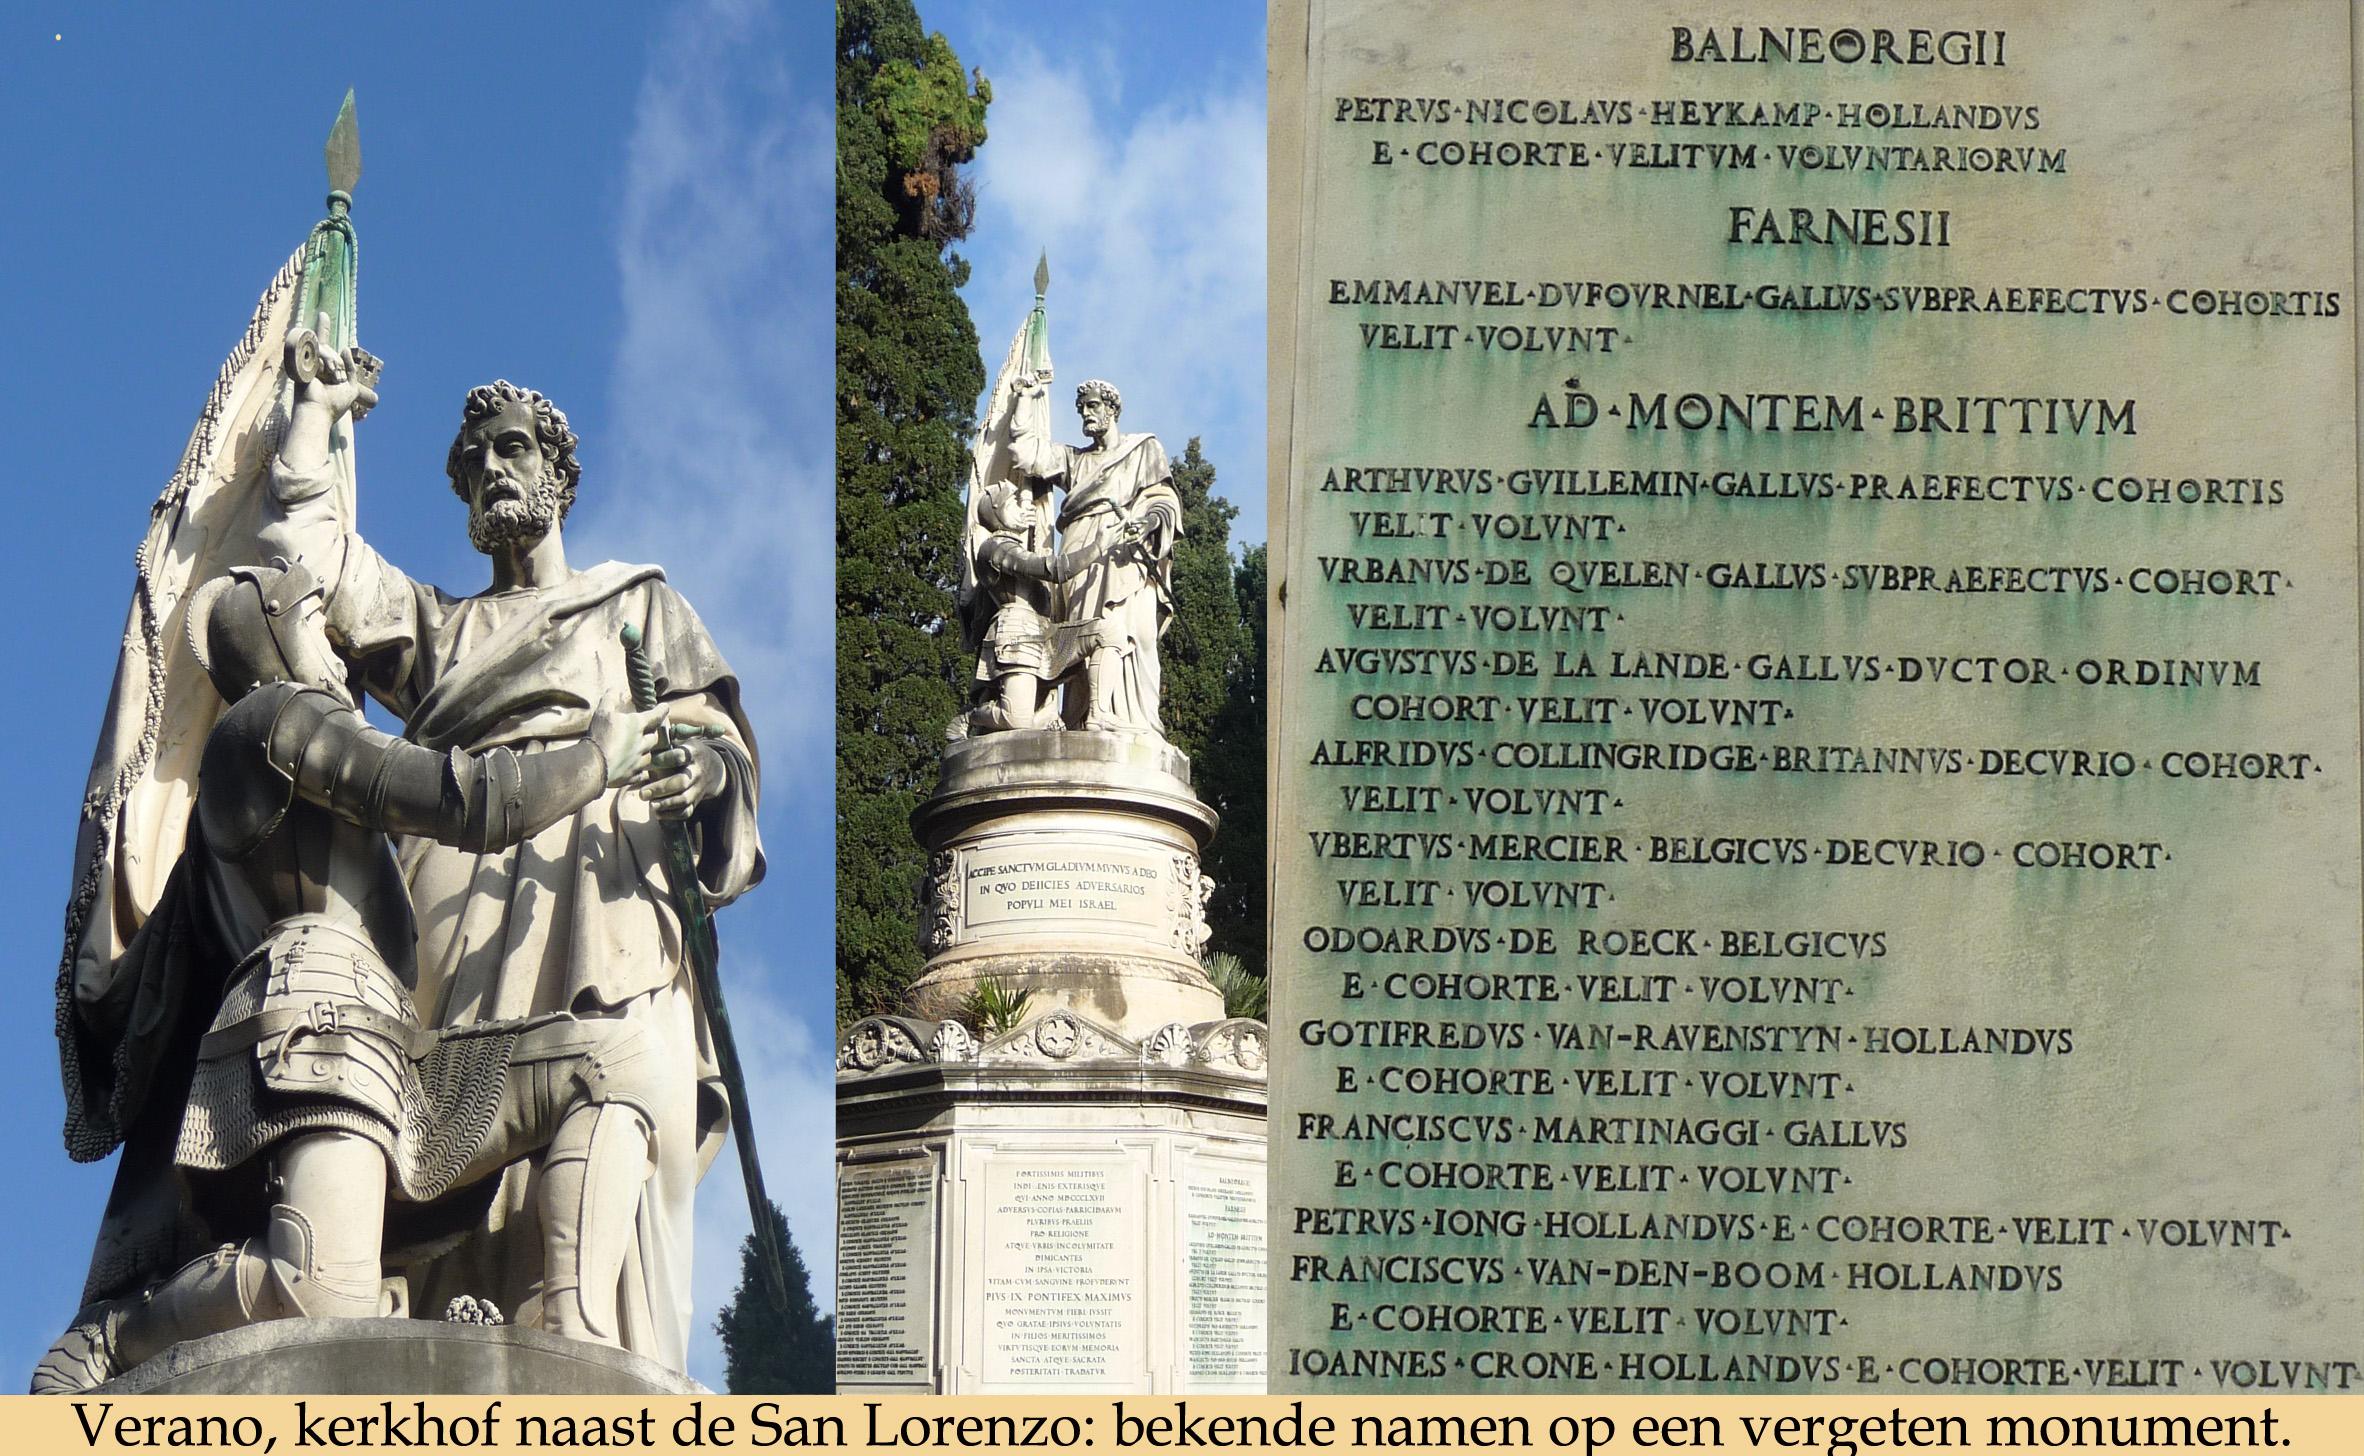 Verano_Monument